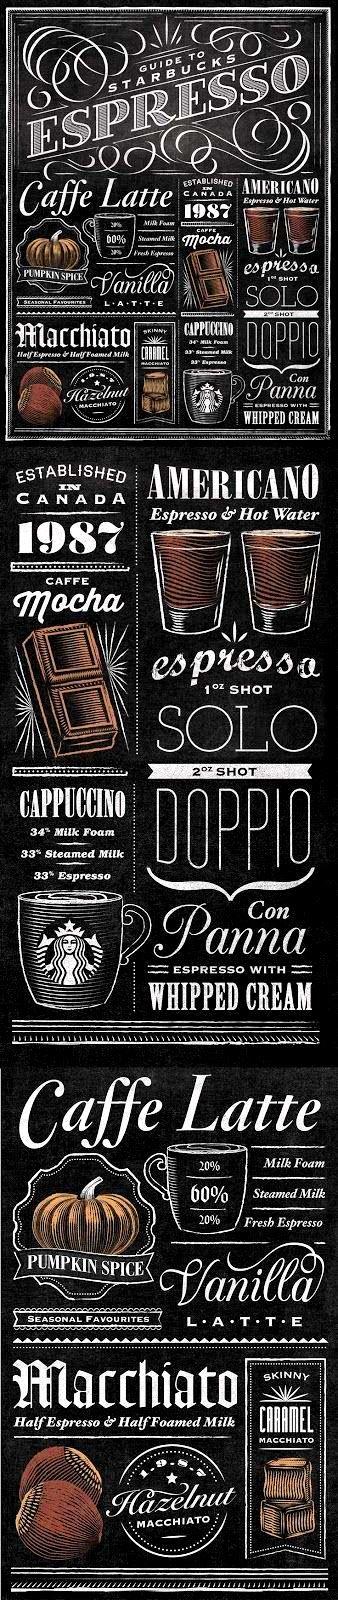 COFFEE CULTURE -